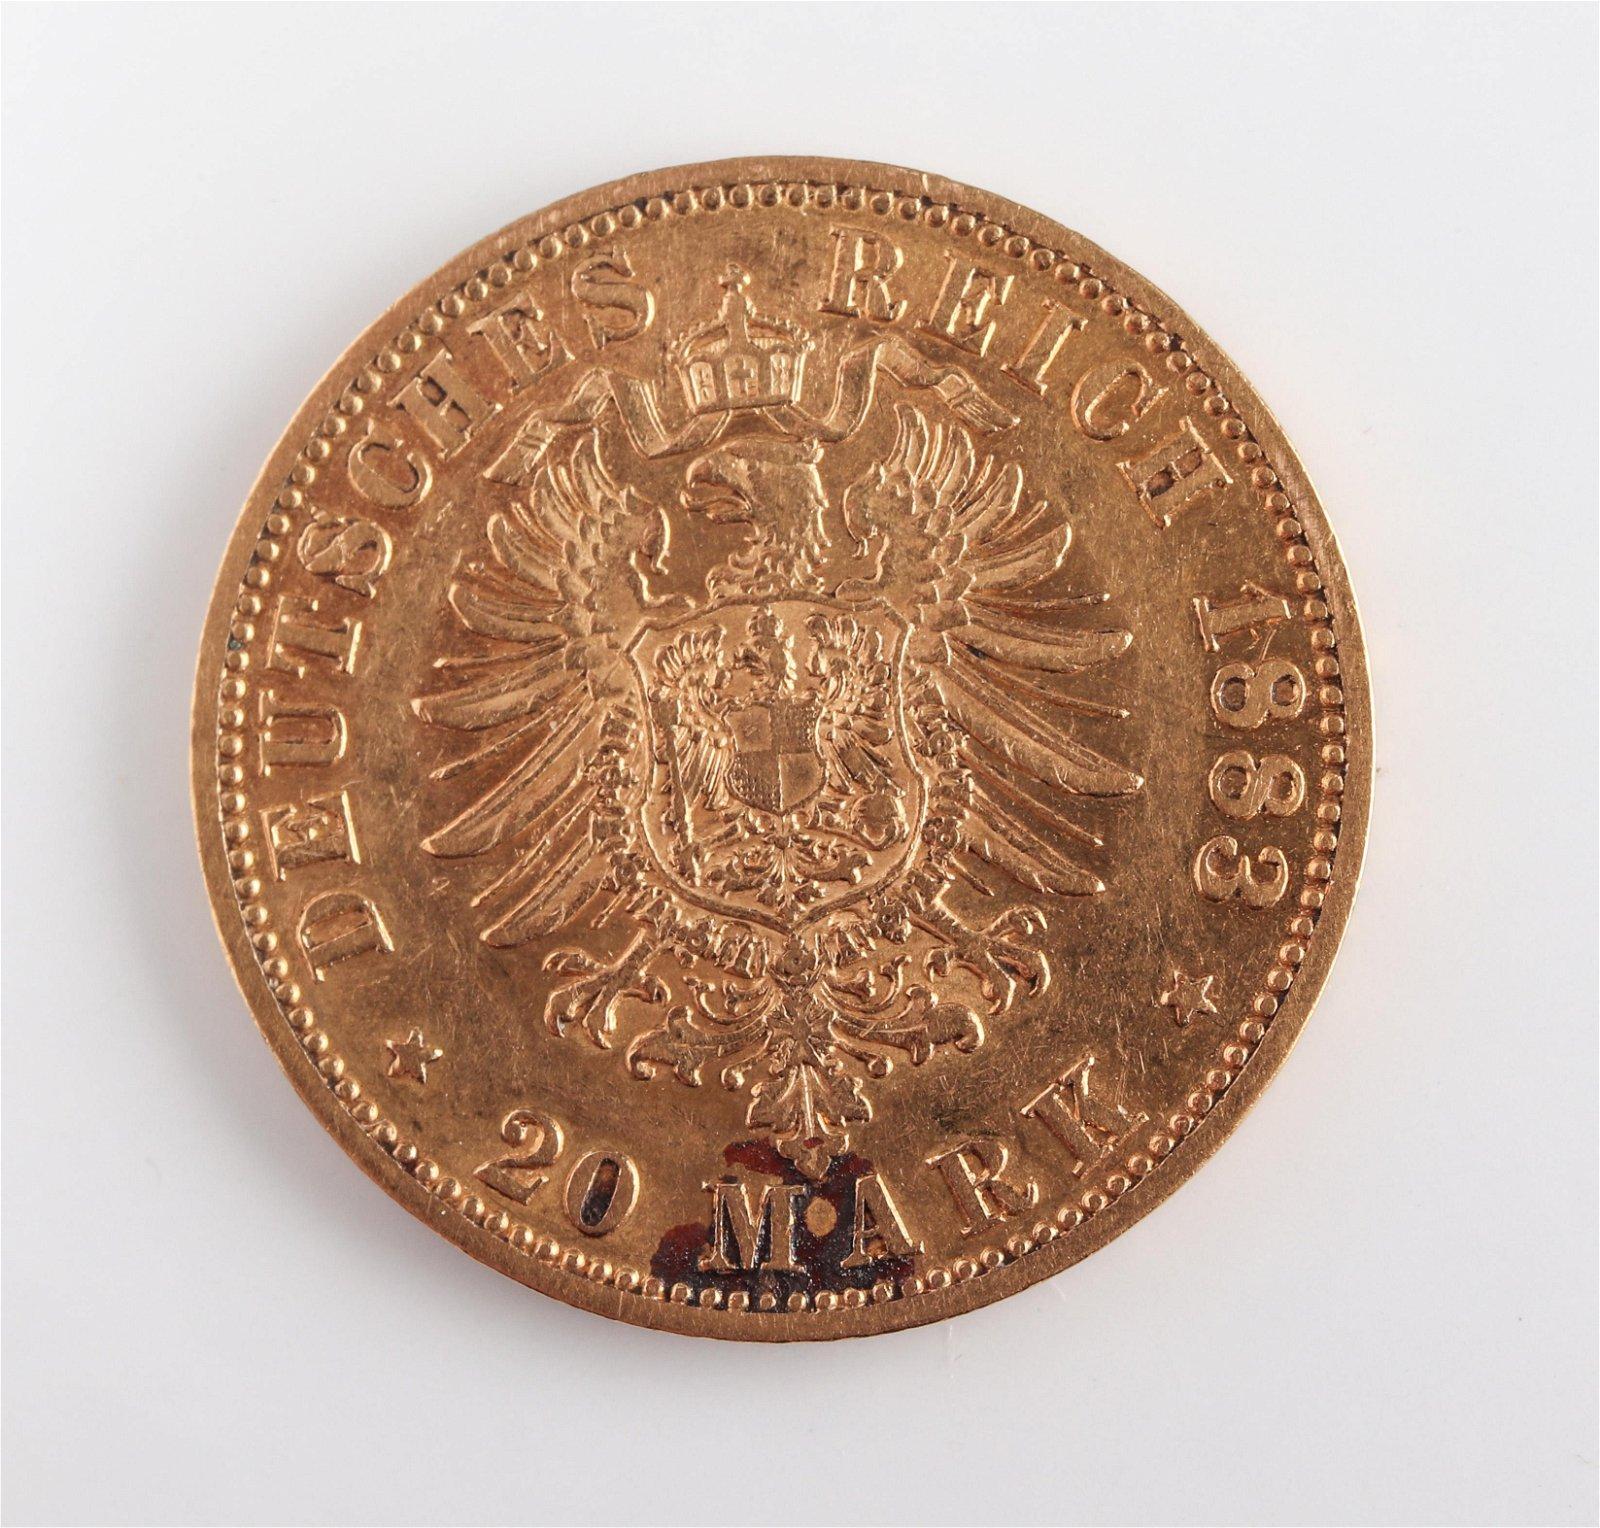 1883 Wilhelm I 20 Mark Gold Coin